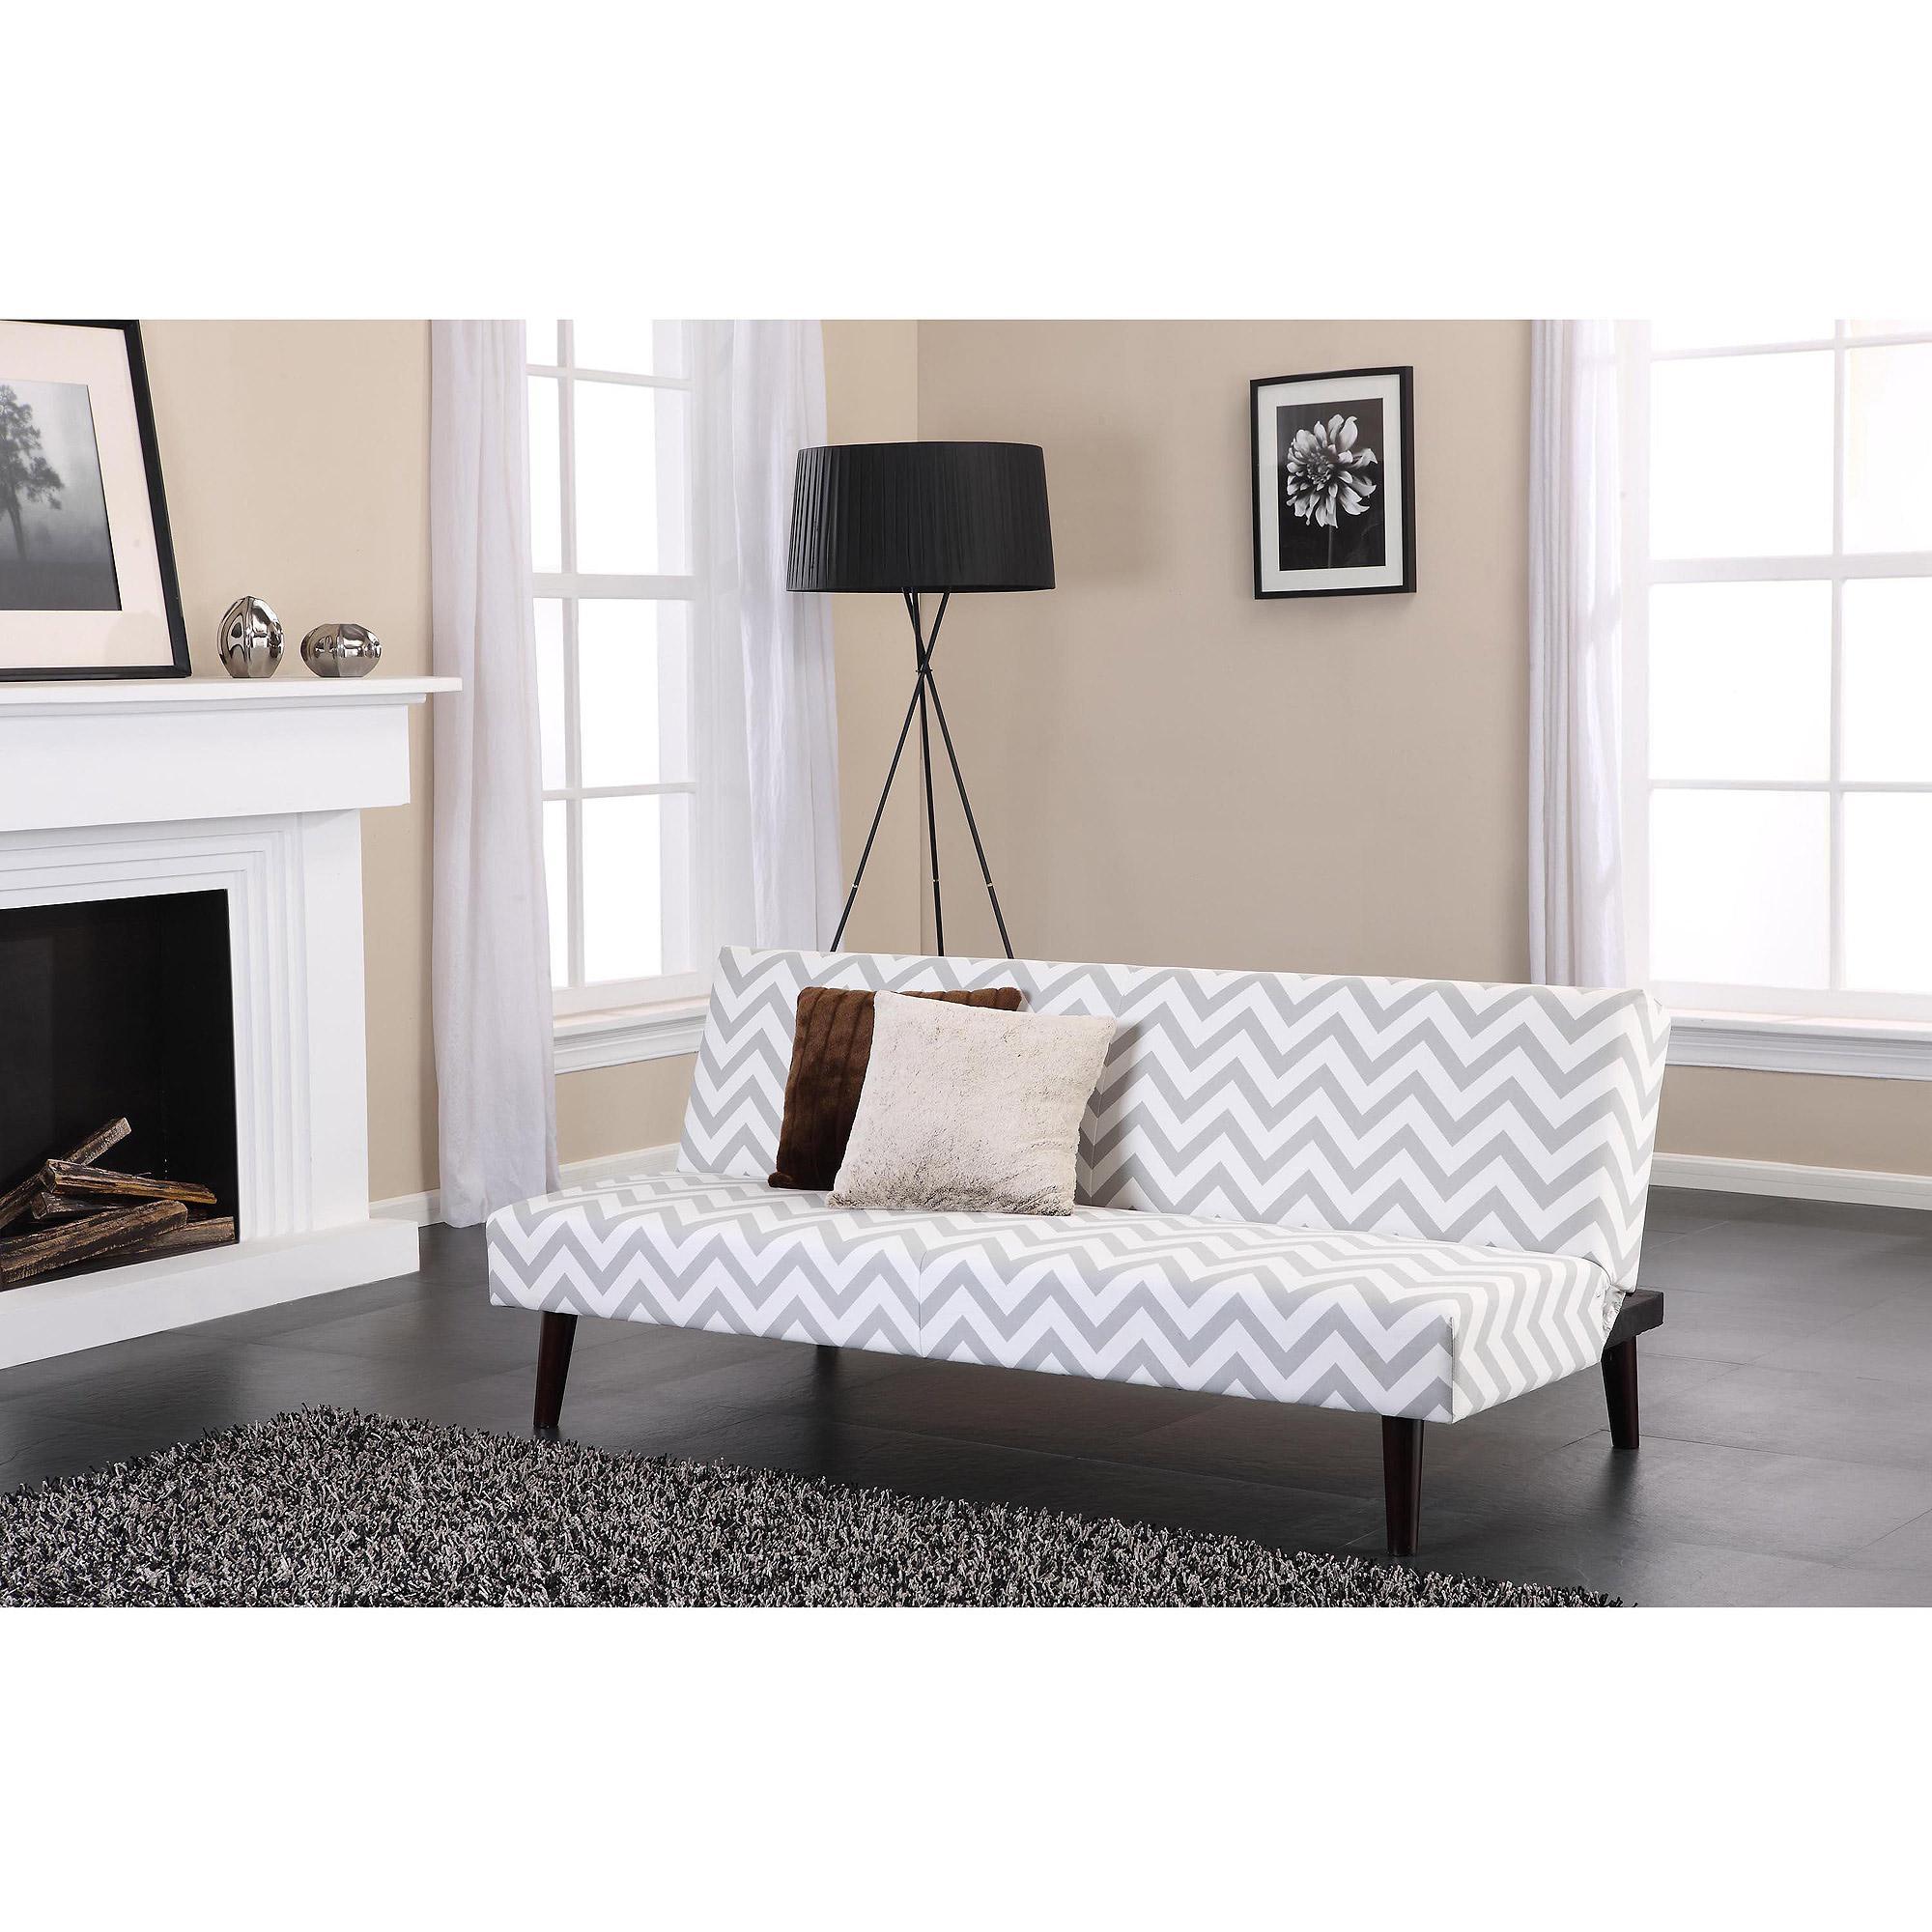 Furniture: Target Futons | Futon Beds Walmart | Couch Bed Walmart Intended For Target Couch Beds (View 14 of 20)